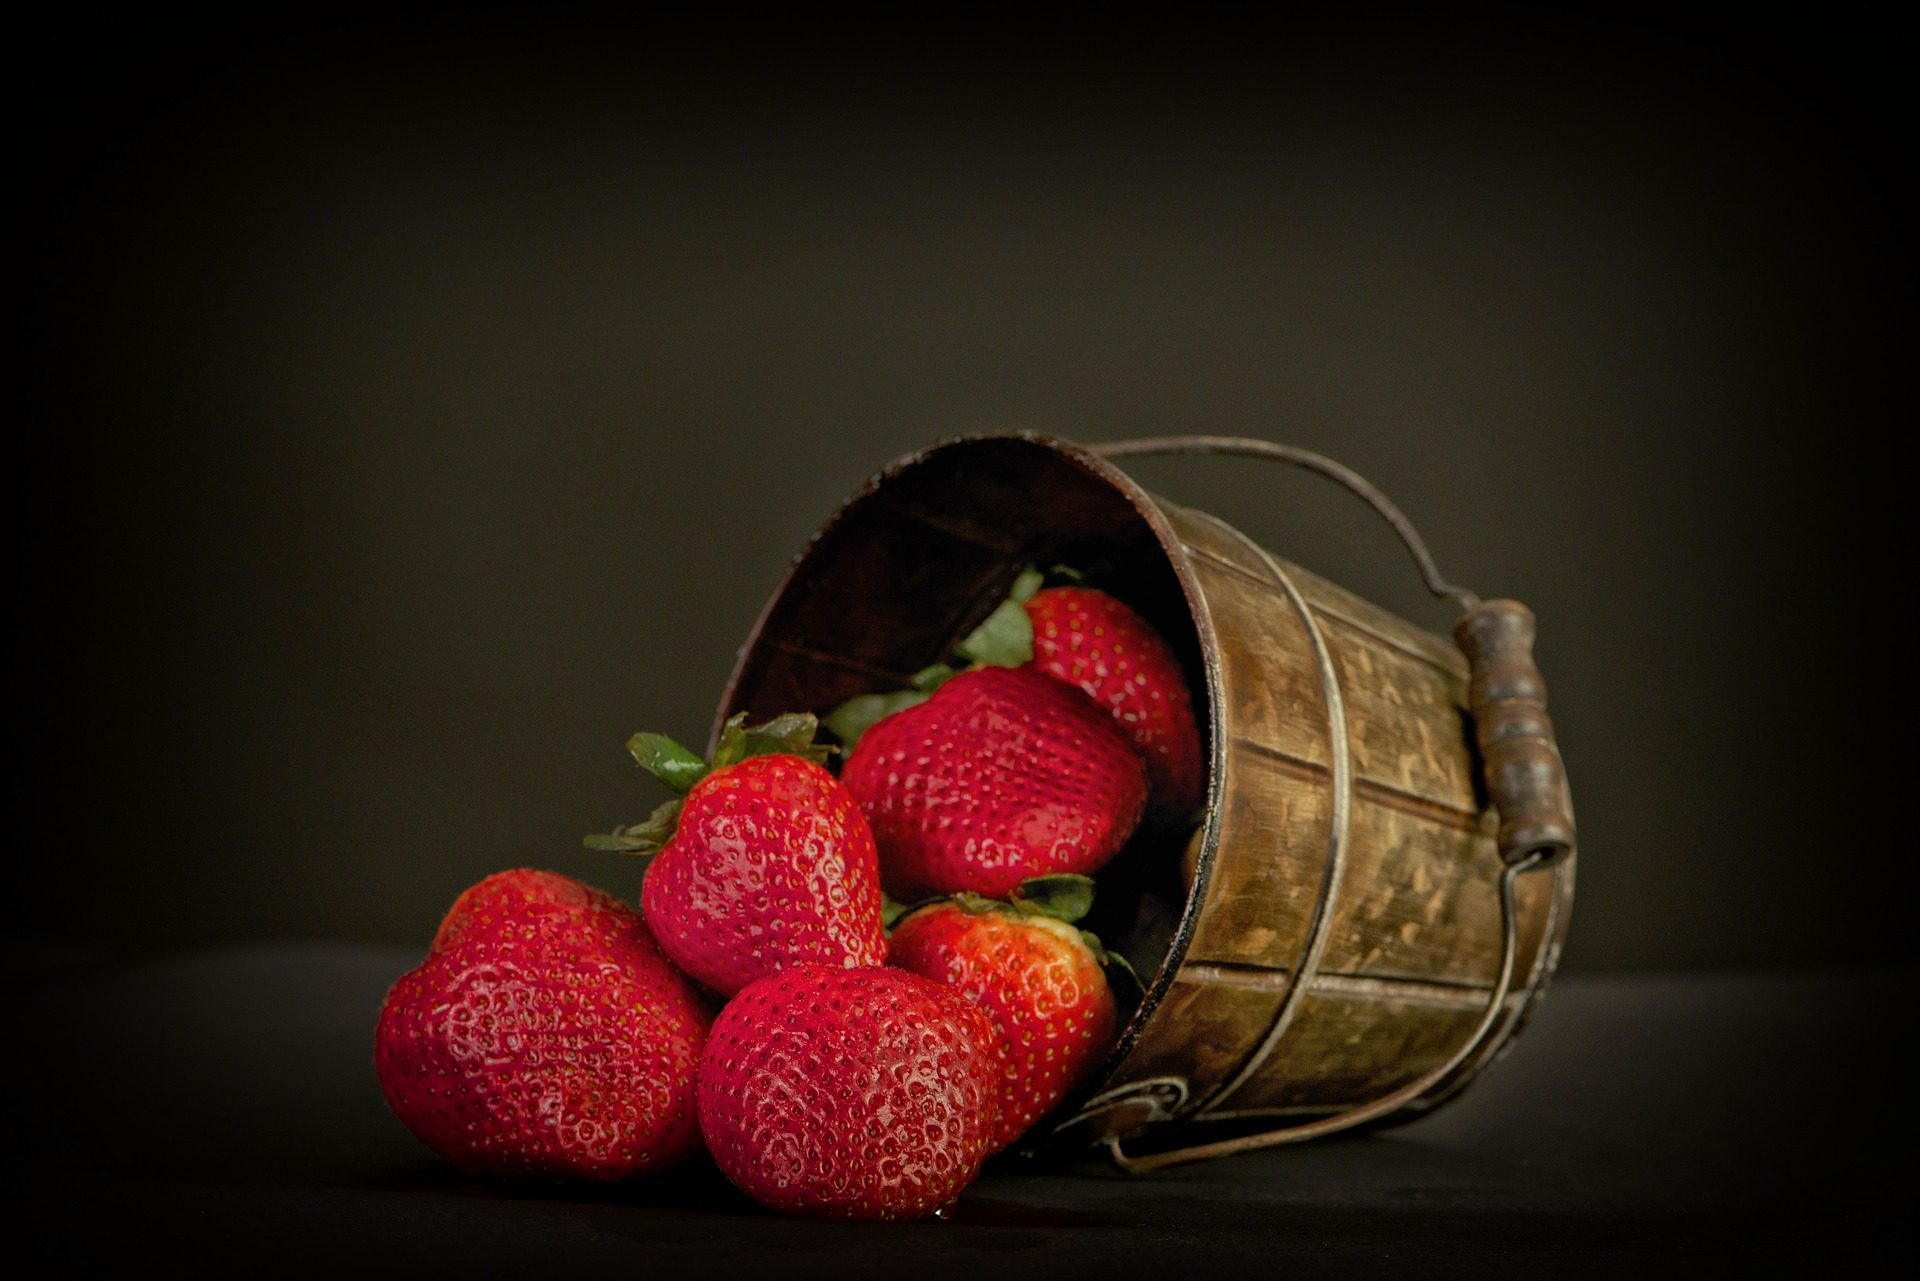 fresas, fruta, cesto, cubo, rojas, brillo - Fondos de Pantalla HD - professor-falken.com